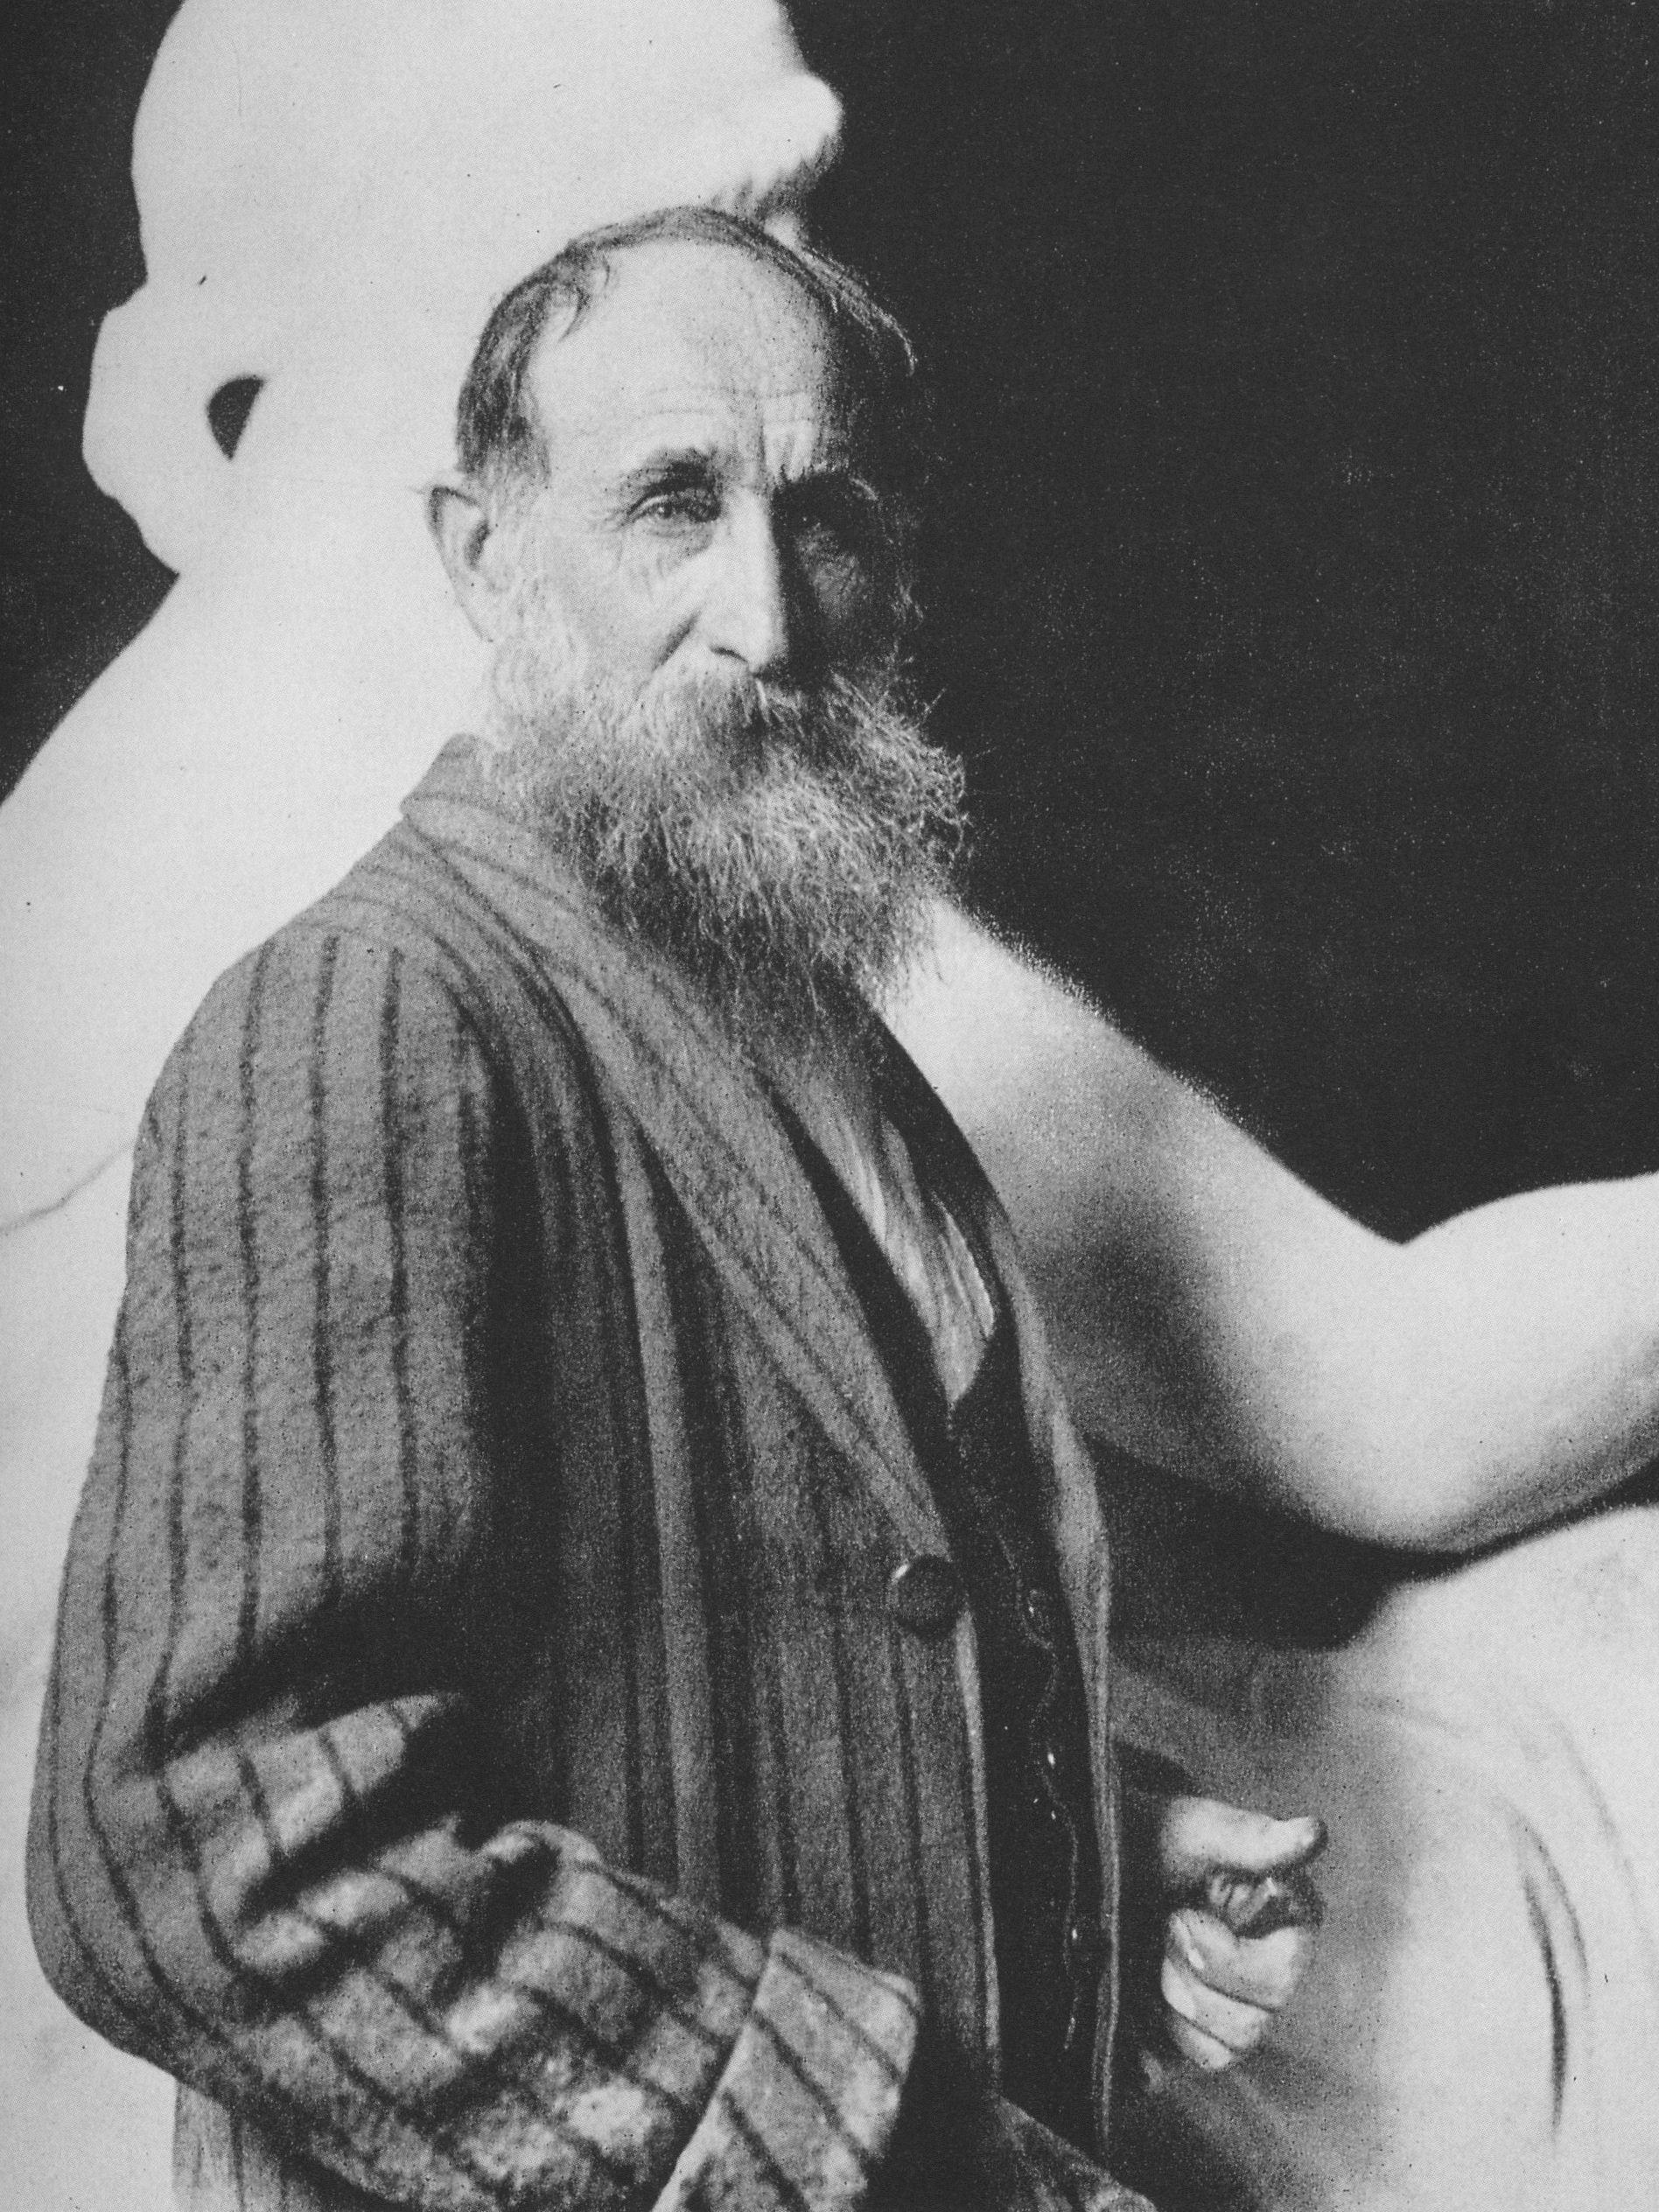 Depiction of Aristide Maillol